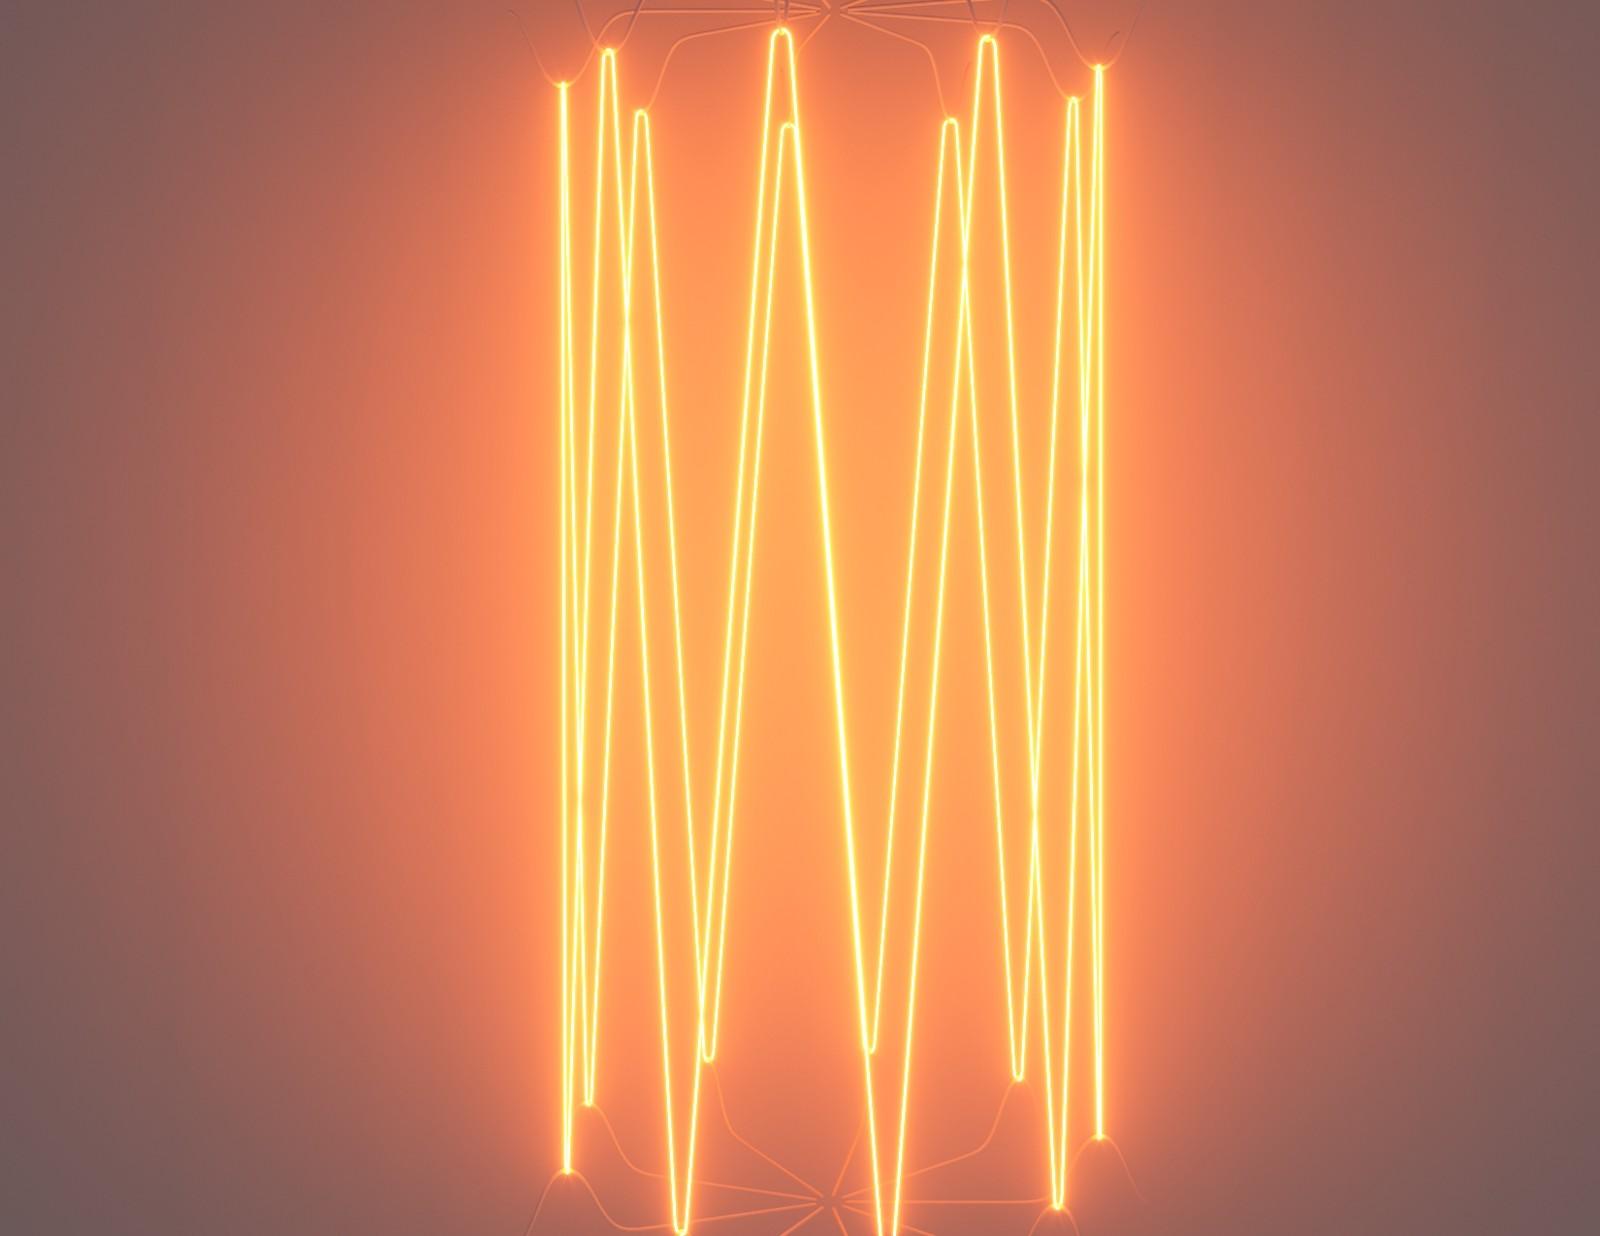 Incandescent Light Test 01. LightMtl - Intensity=350 Temp=2700K. Bloom=5. Glare=0.1